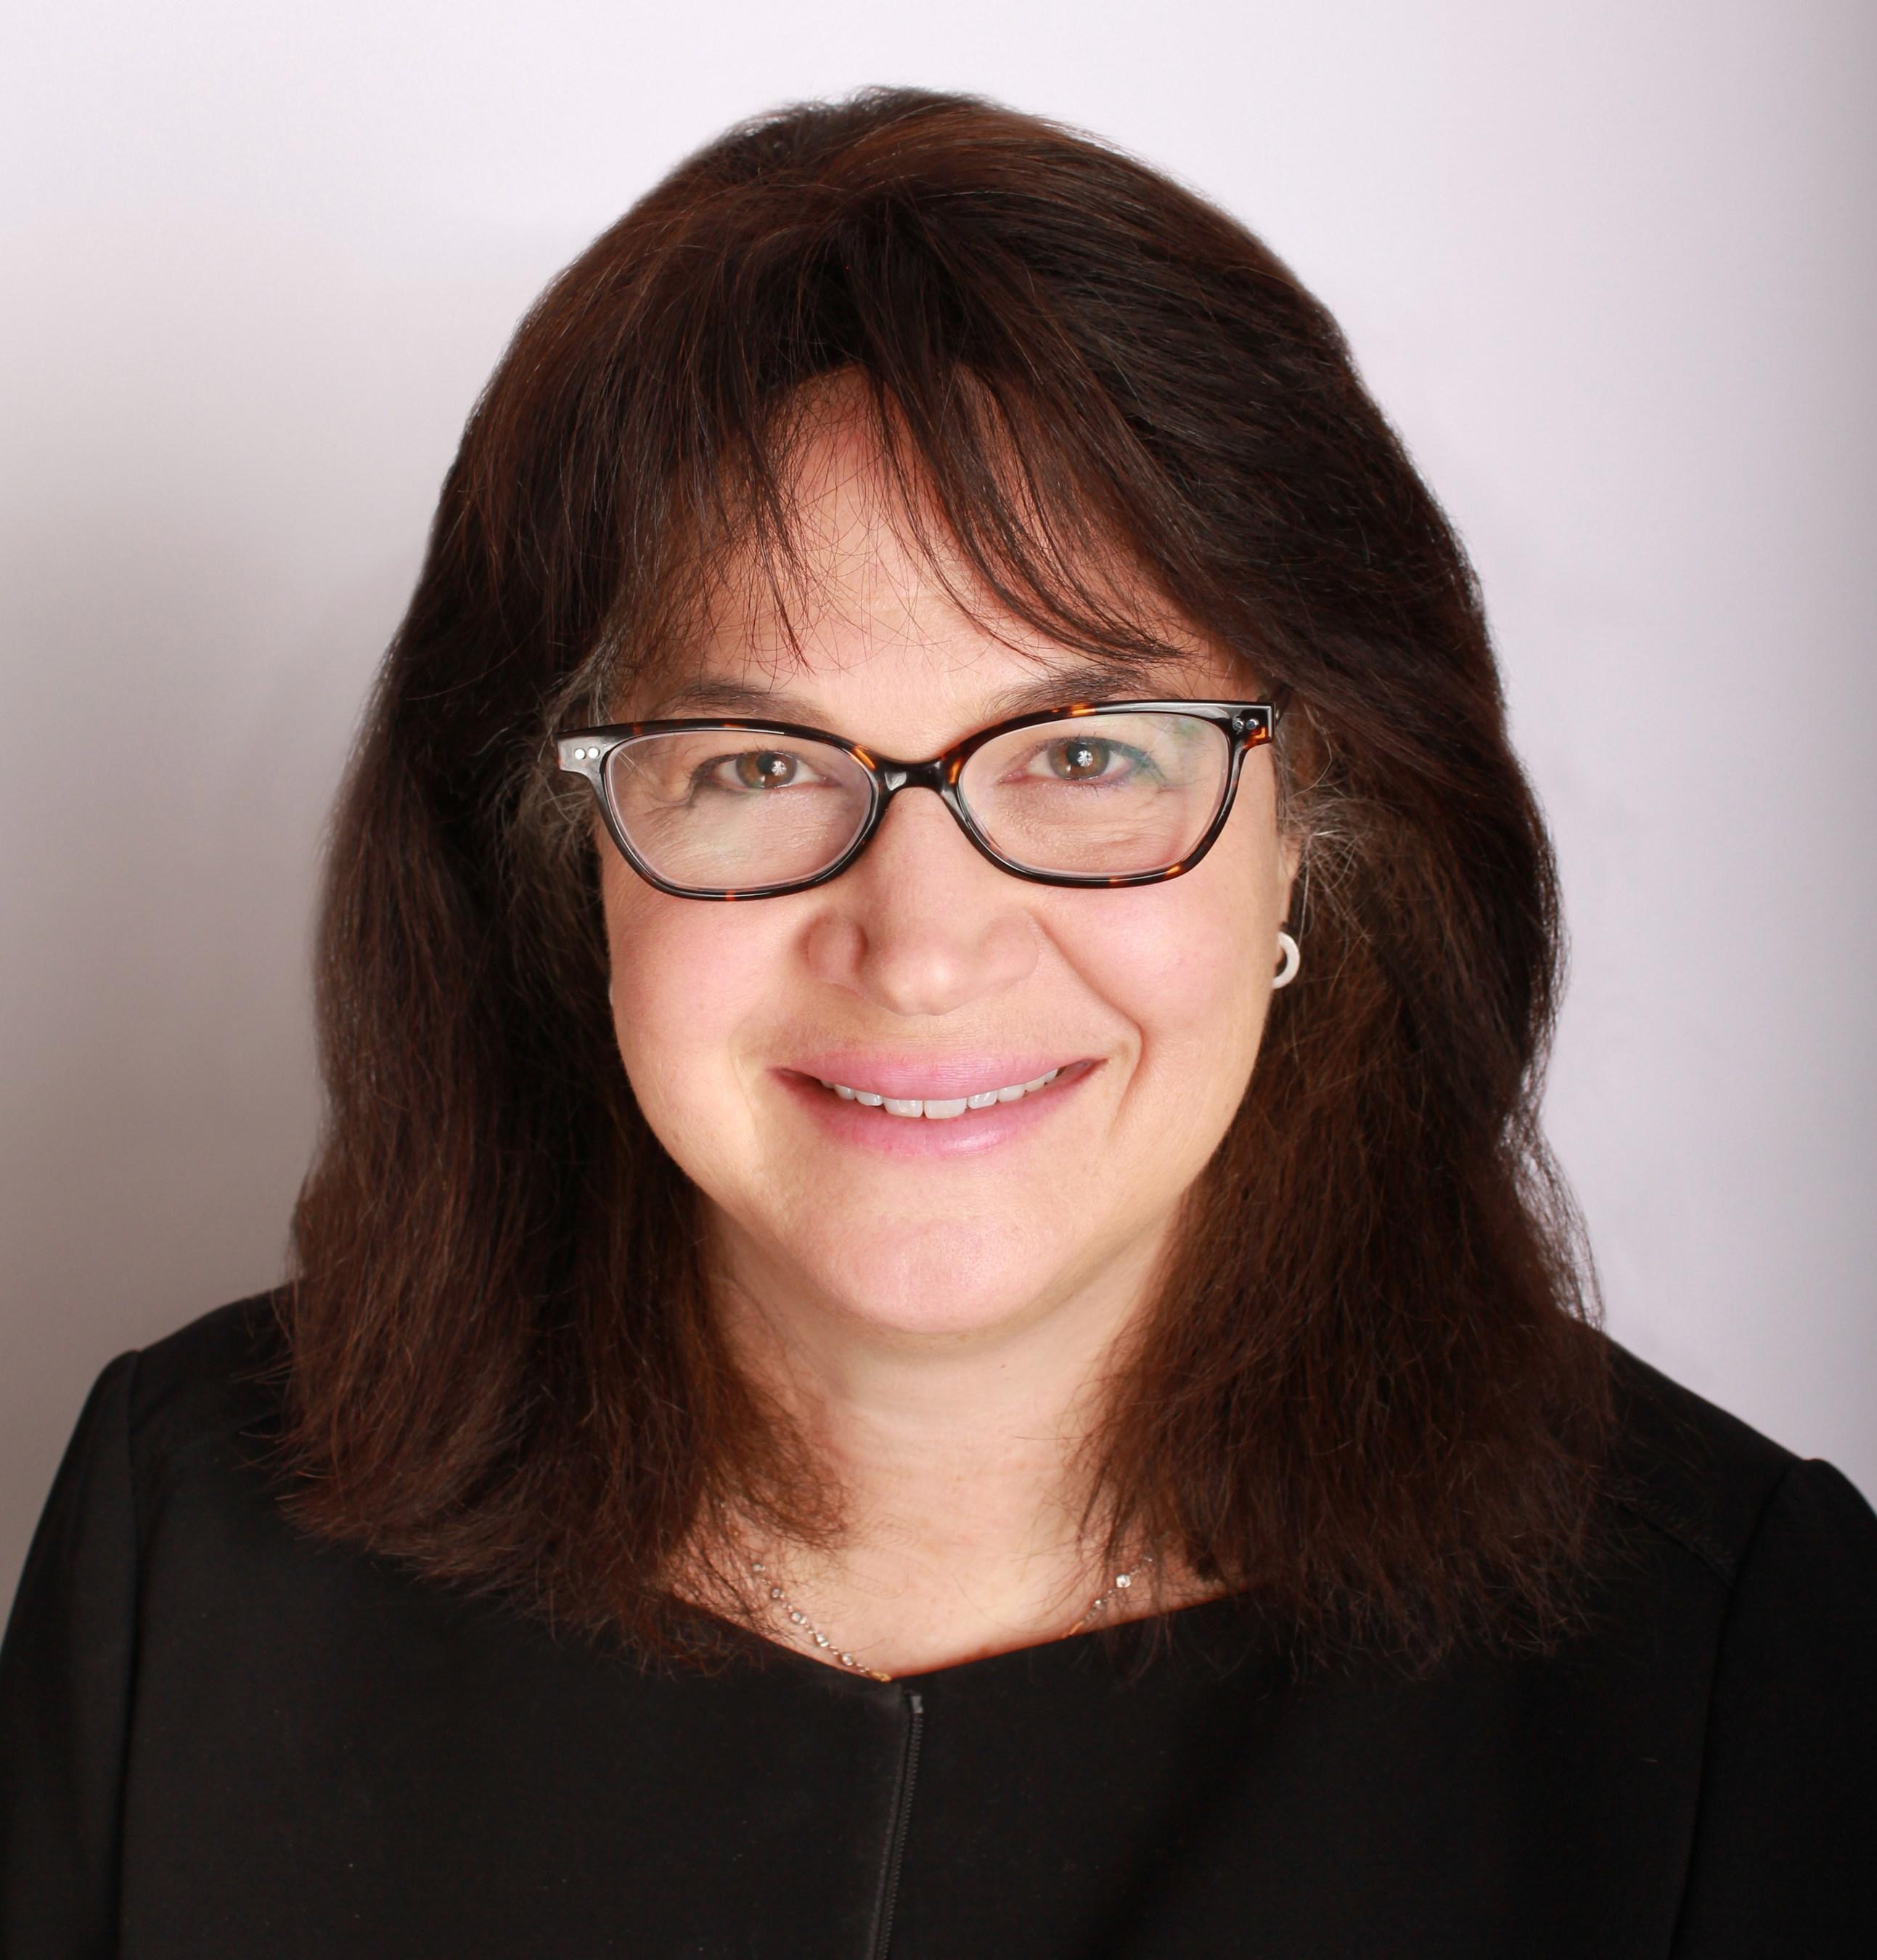 Debra Somberg, Trustee, Seattle Foundation